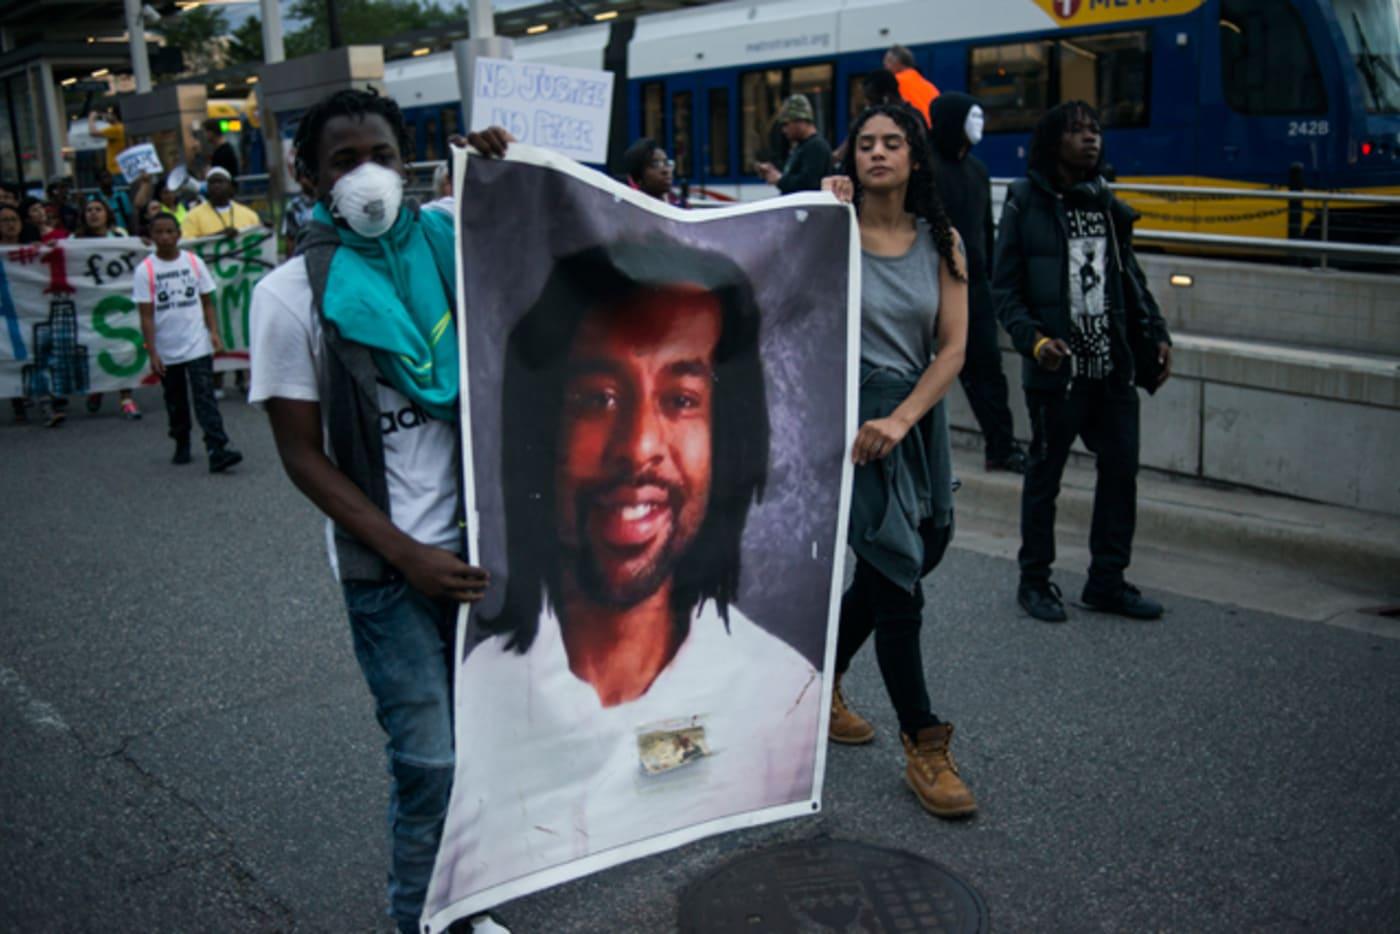 Protests Erupt After Minnesota Officer Acquitted In Killing Of Philando Castile